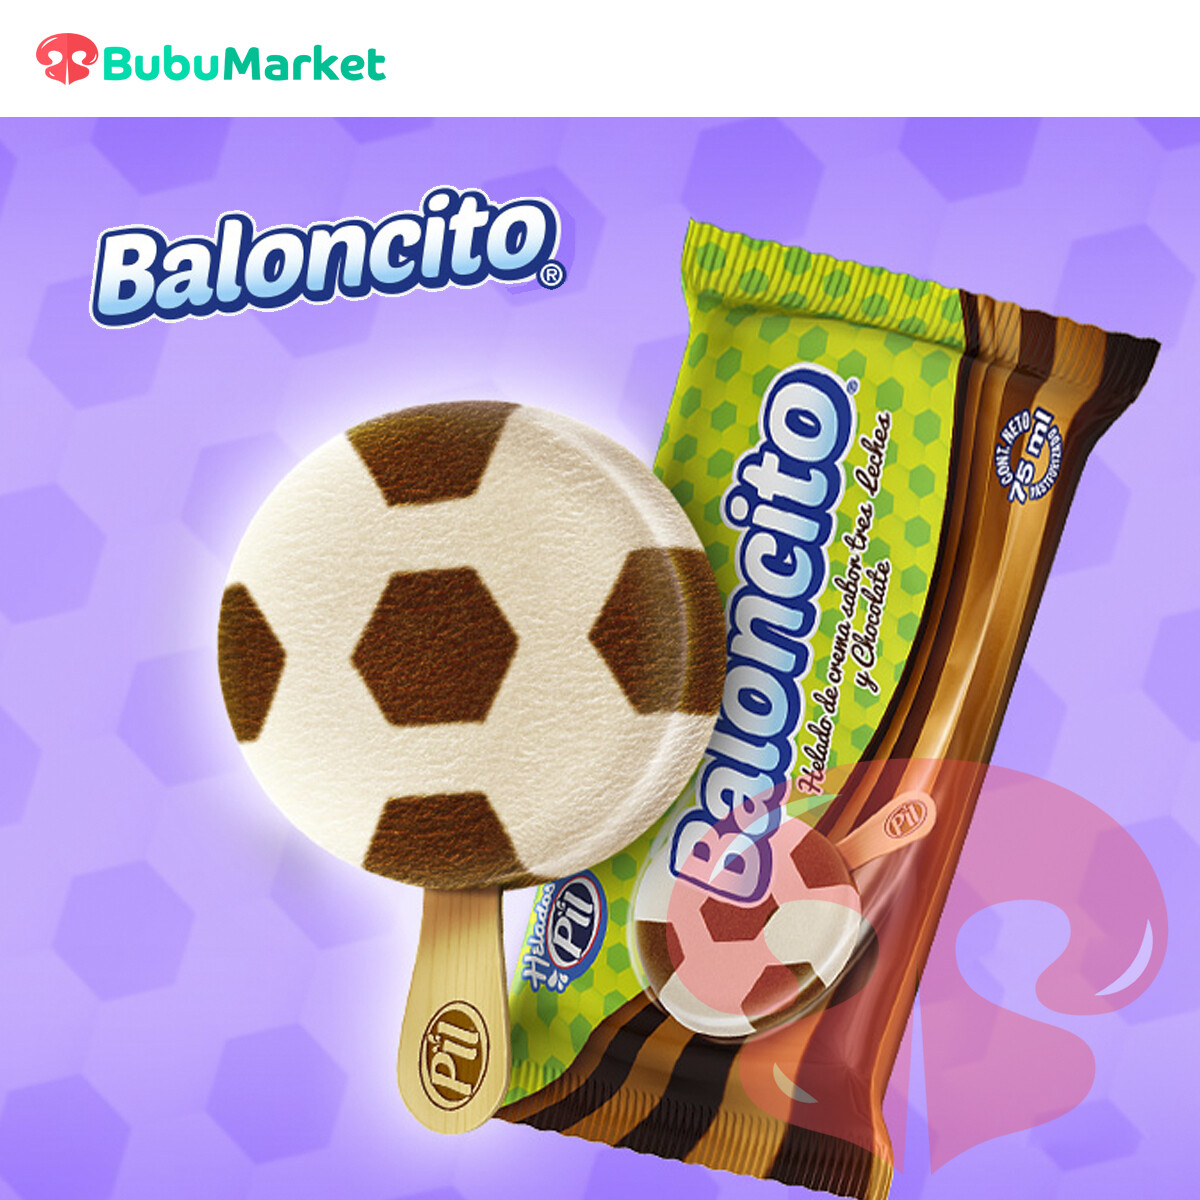 HELADO PIL PALETA DE CREMA BALONCITO 3 LECHES Y CHOCOLATE 70 ML.